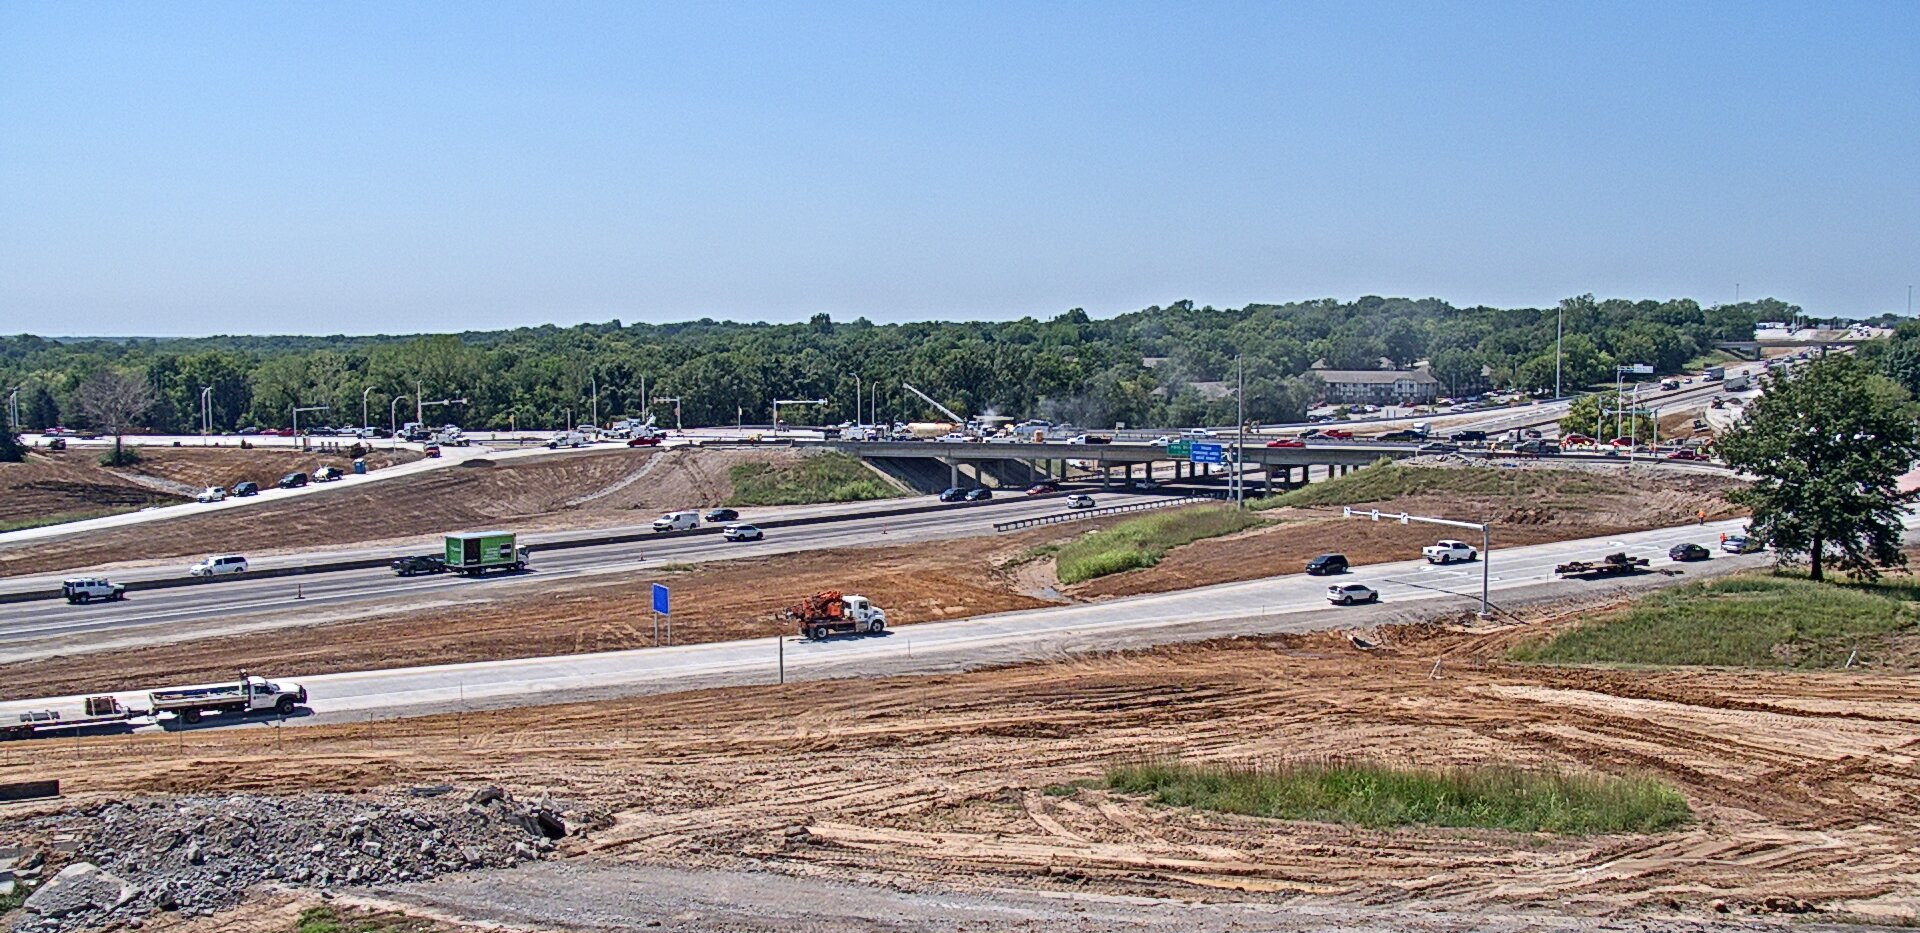 2020.09.04 Turner Construction.jpg